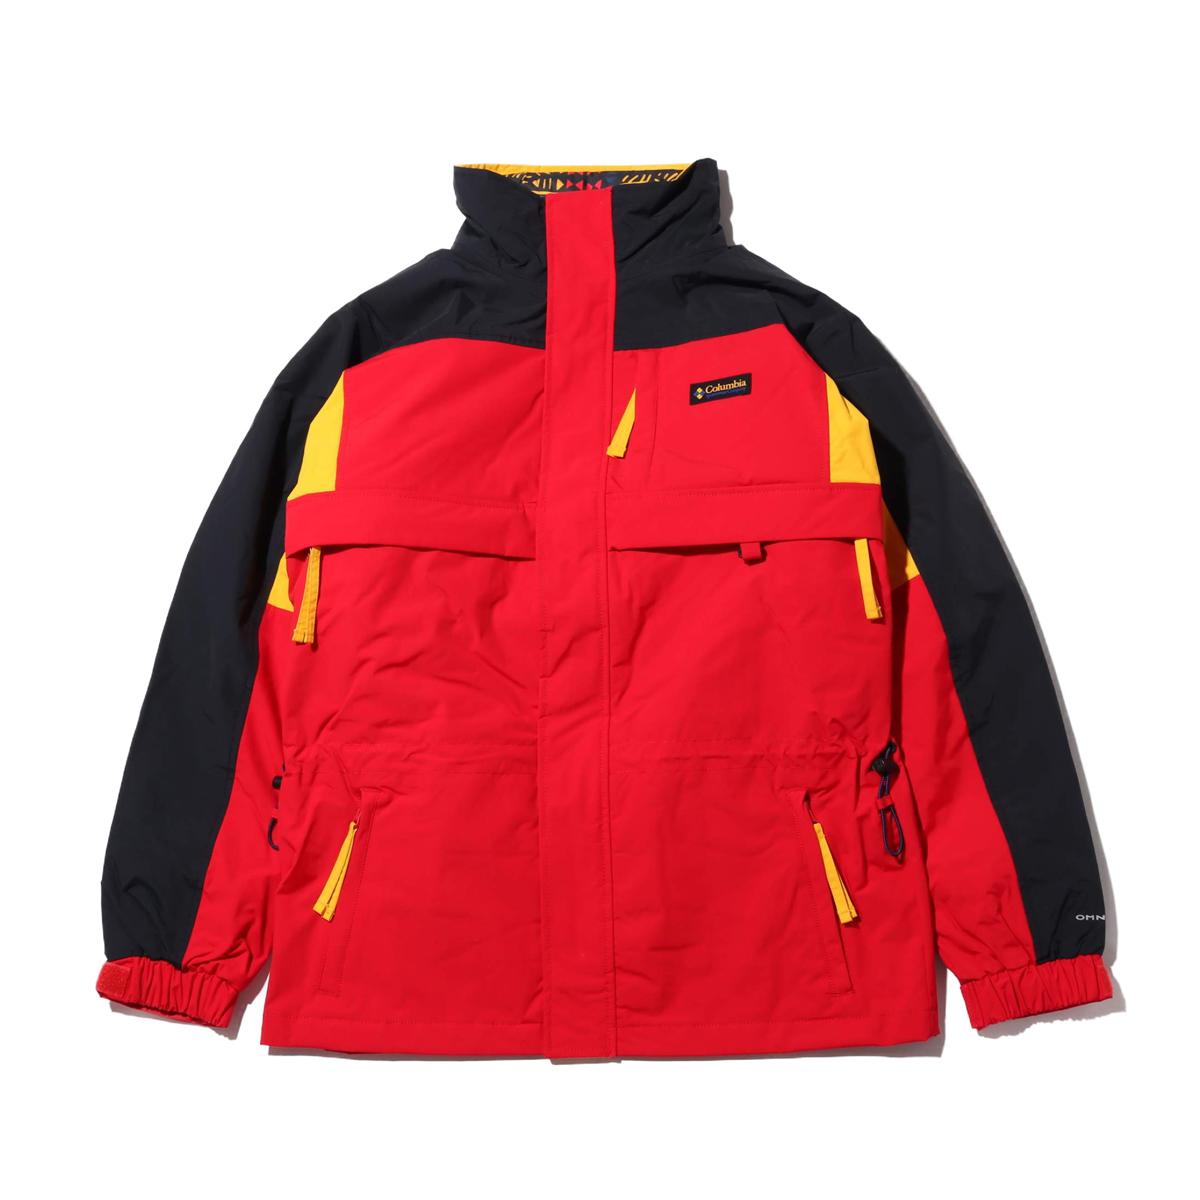 Columbia Gizzmo™ Interchange Parka(Mountain Red, Black)(コロンビア ギズモ インターチェンジ パーカー)【メンズ】【パーカー】【19FA-I】